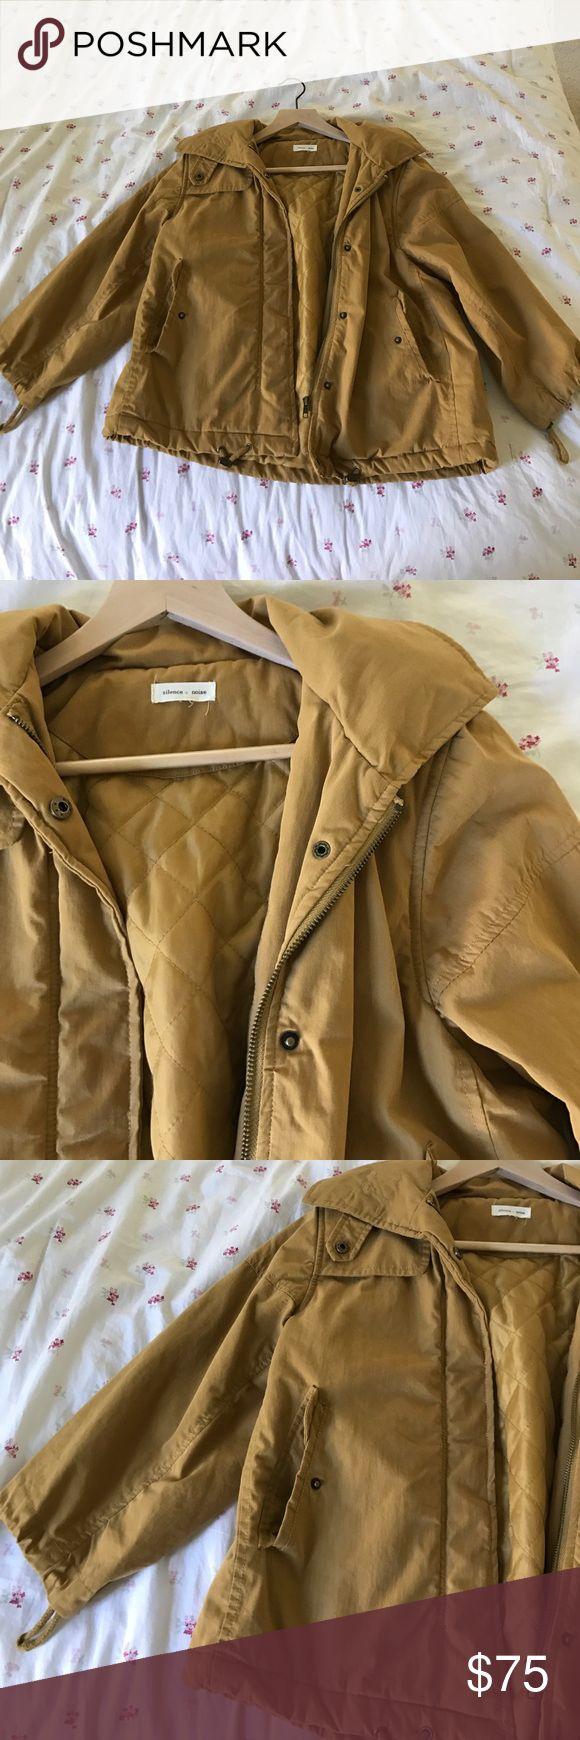 Mustard puffer coat. Light jacket. With hood Urban outfitters Urban Outfitters Jackets & Coats Puffers